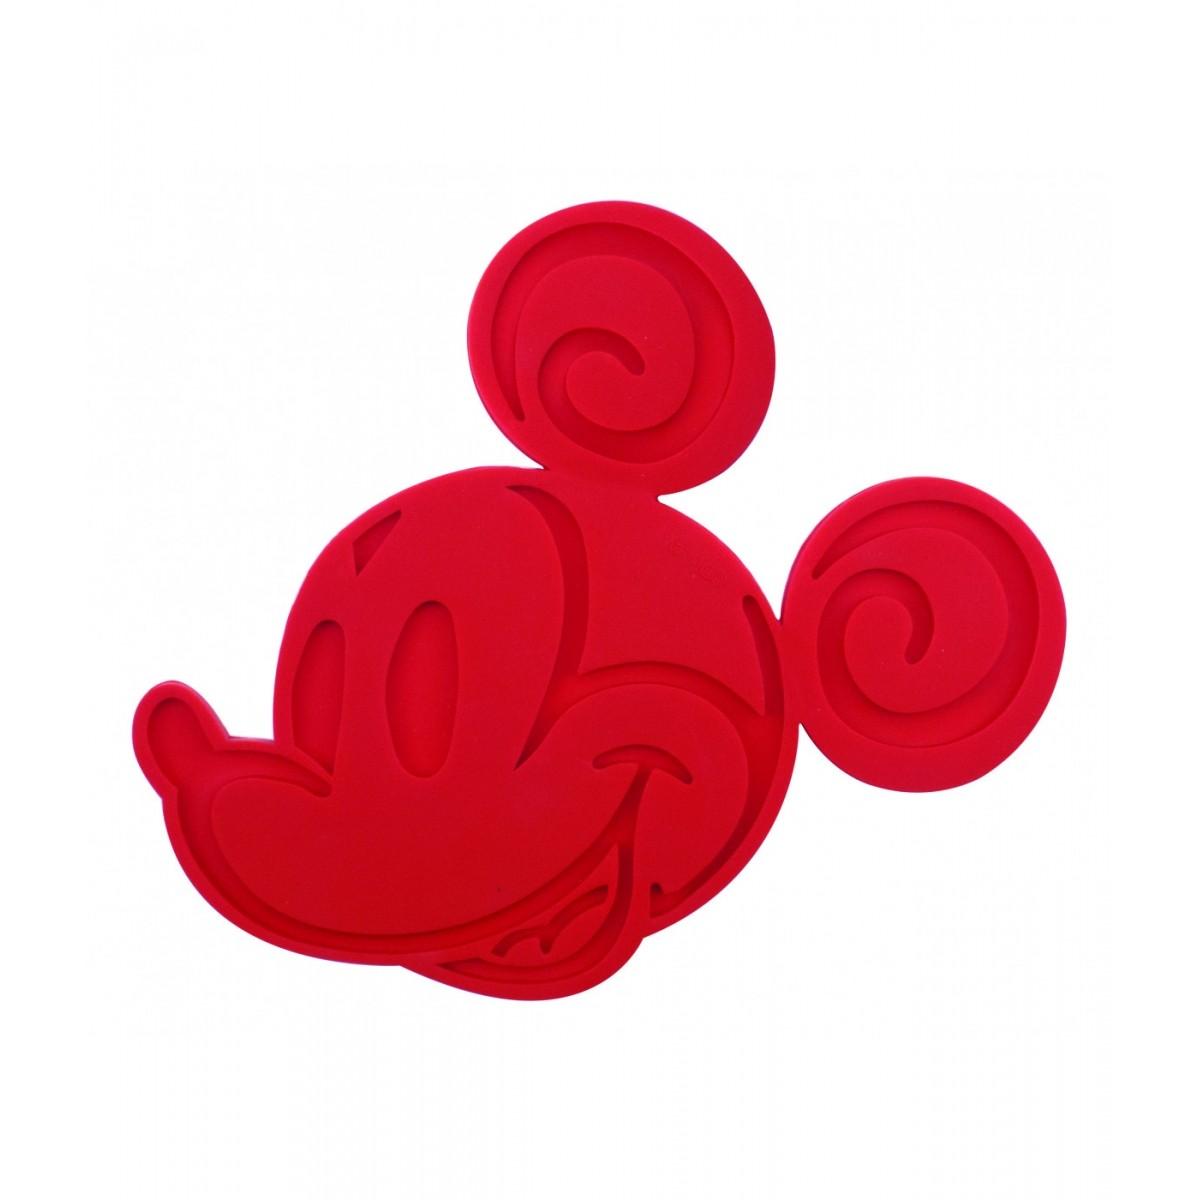 Suporte de Panela Rosto Mickey Mouse - Disney